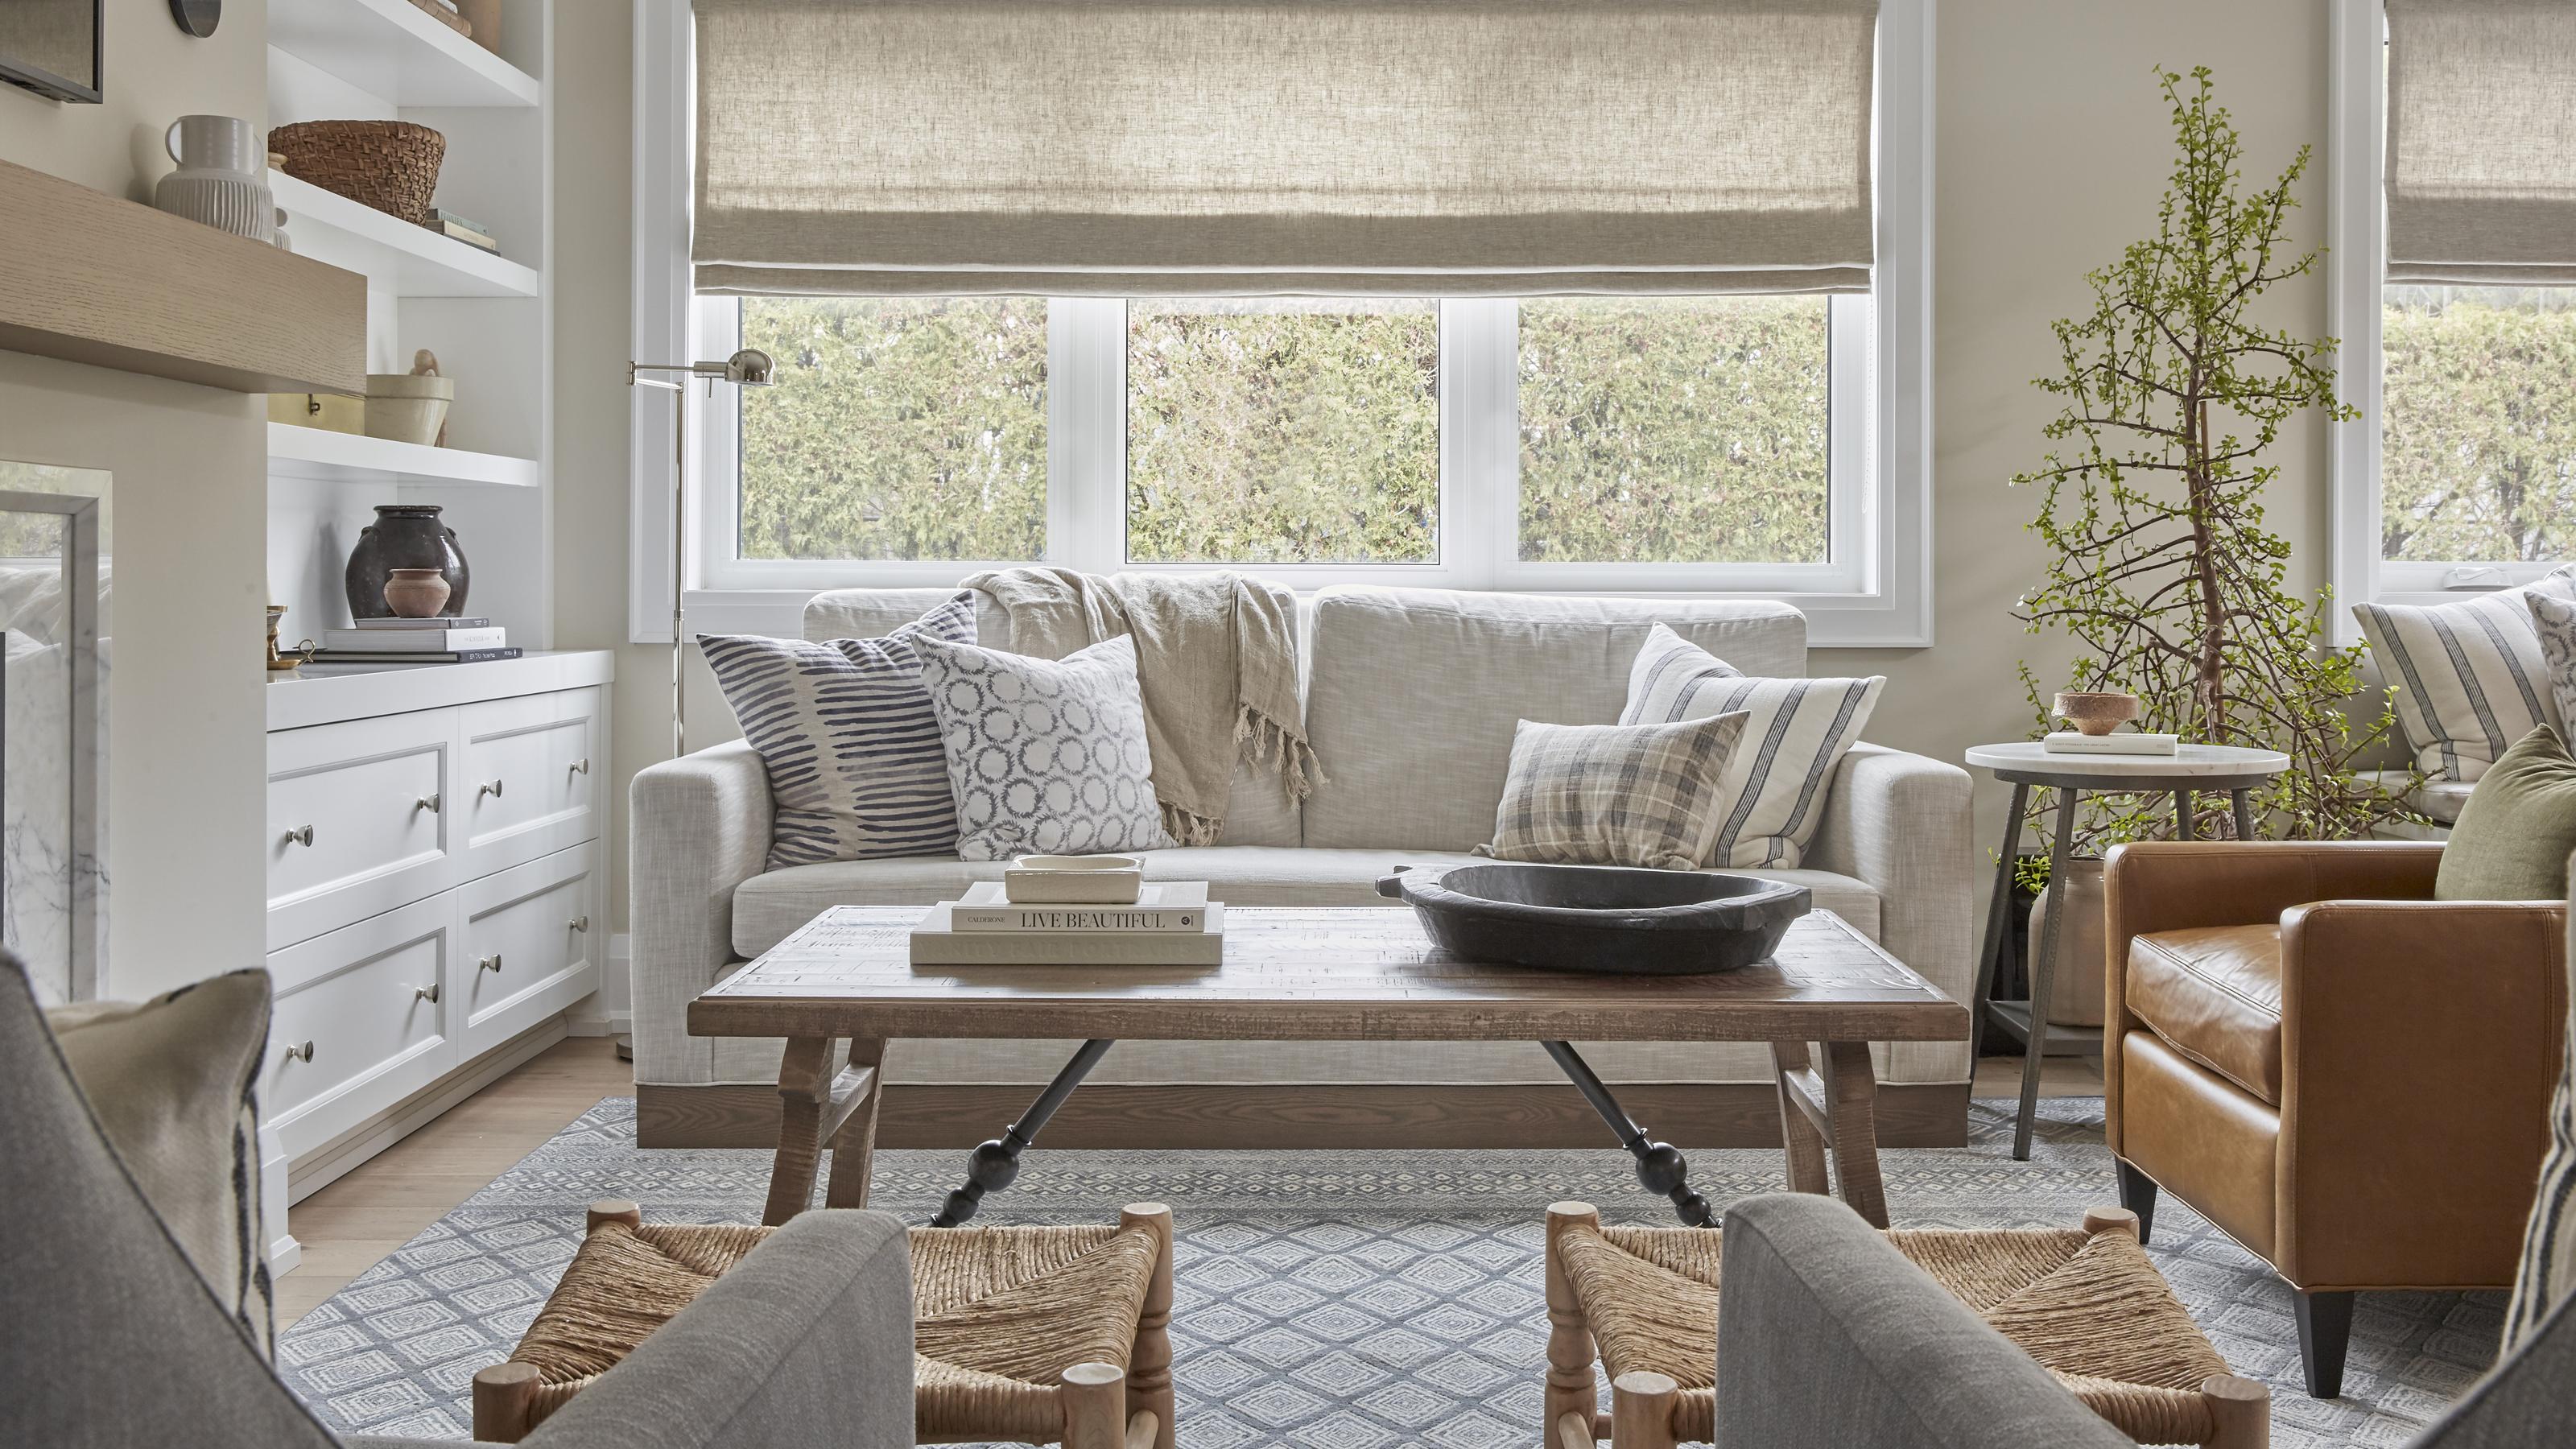 Grey Sofa Living Room Ideas 10, Gray Couch Living Room Design